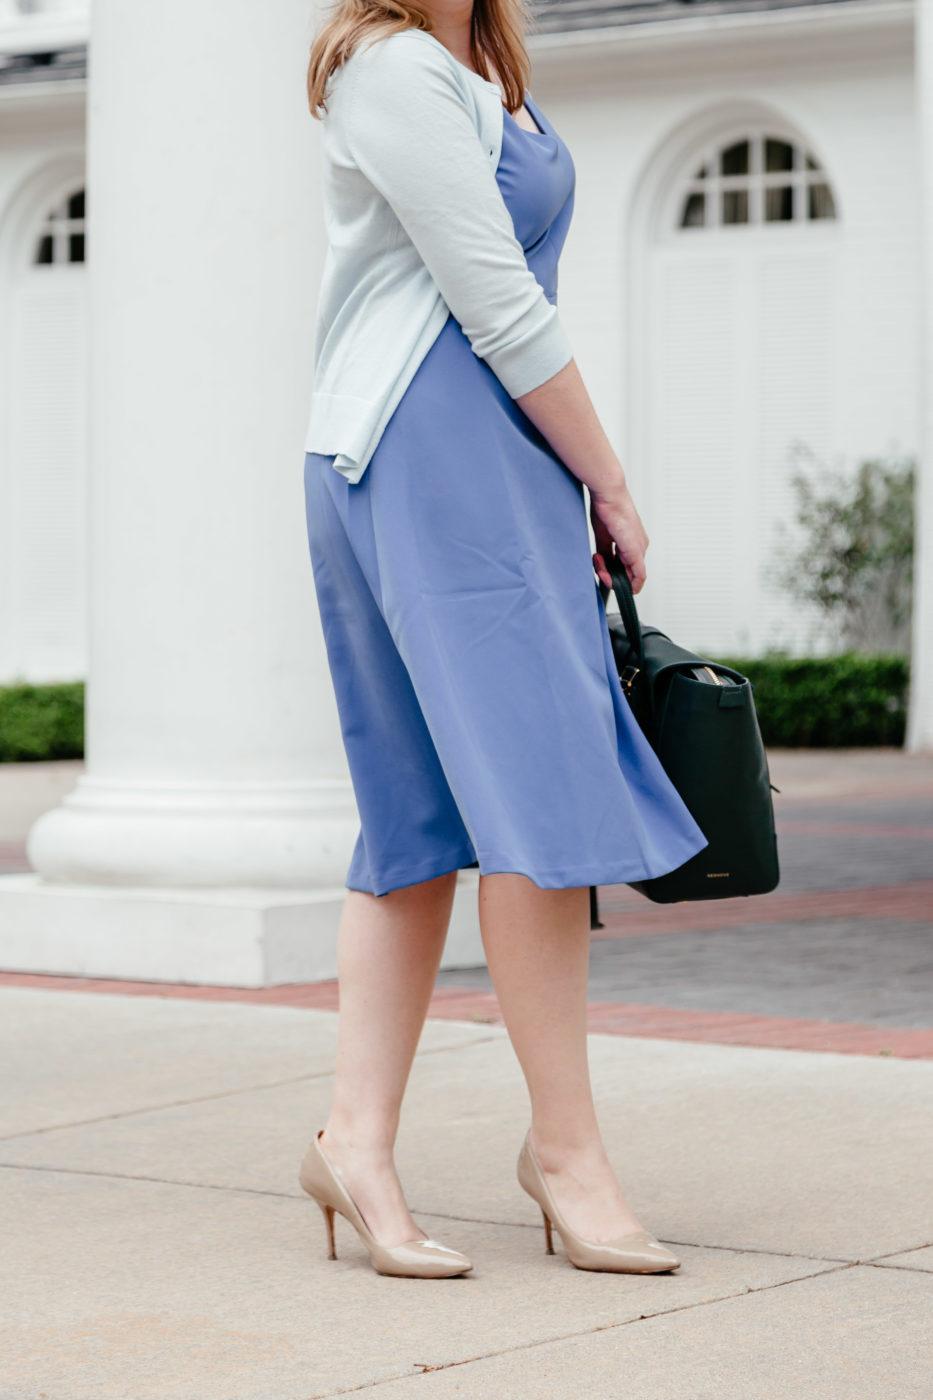 Blue Dress to Wear to Work | Best Dress Silhouettes for Work | Comfy Heels to Wear to Work | Comfy Nude Heels via Amanda Kushner of Glitter & Spice